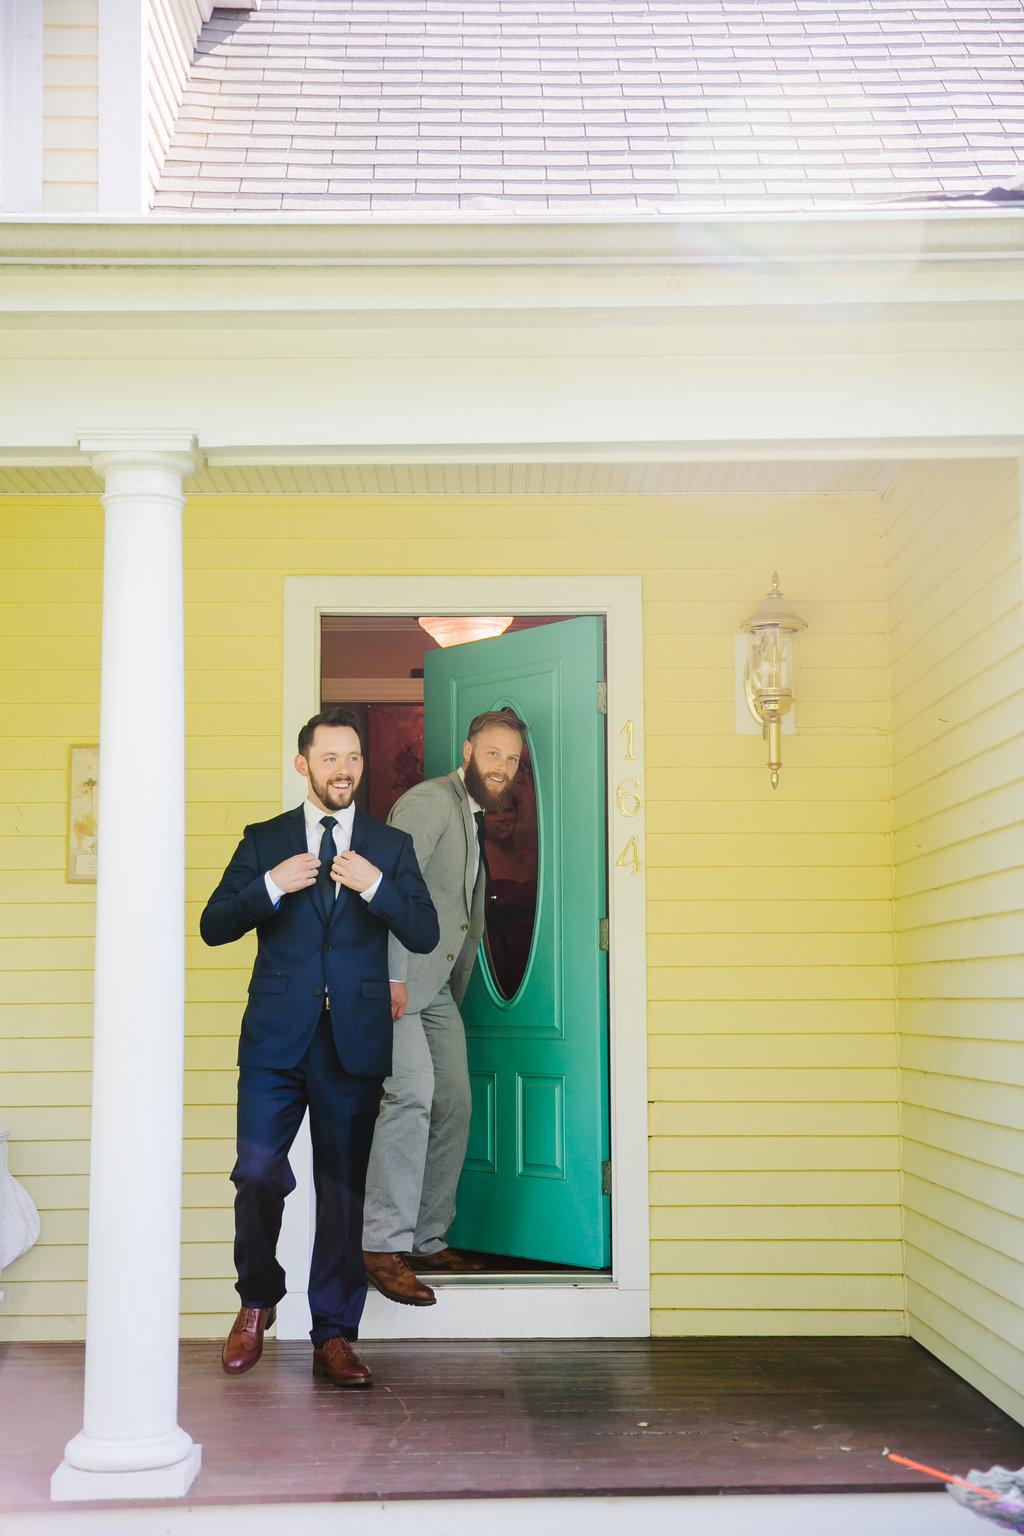 Claire+JimWedding-EmilyTebbettsPhotography--60.jpg